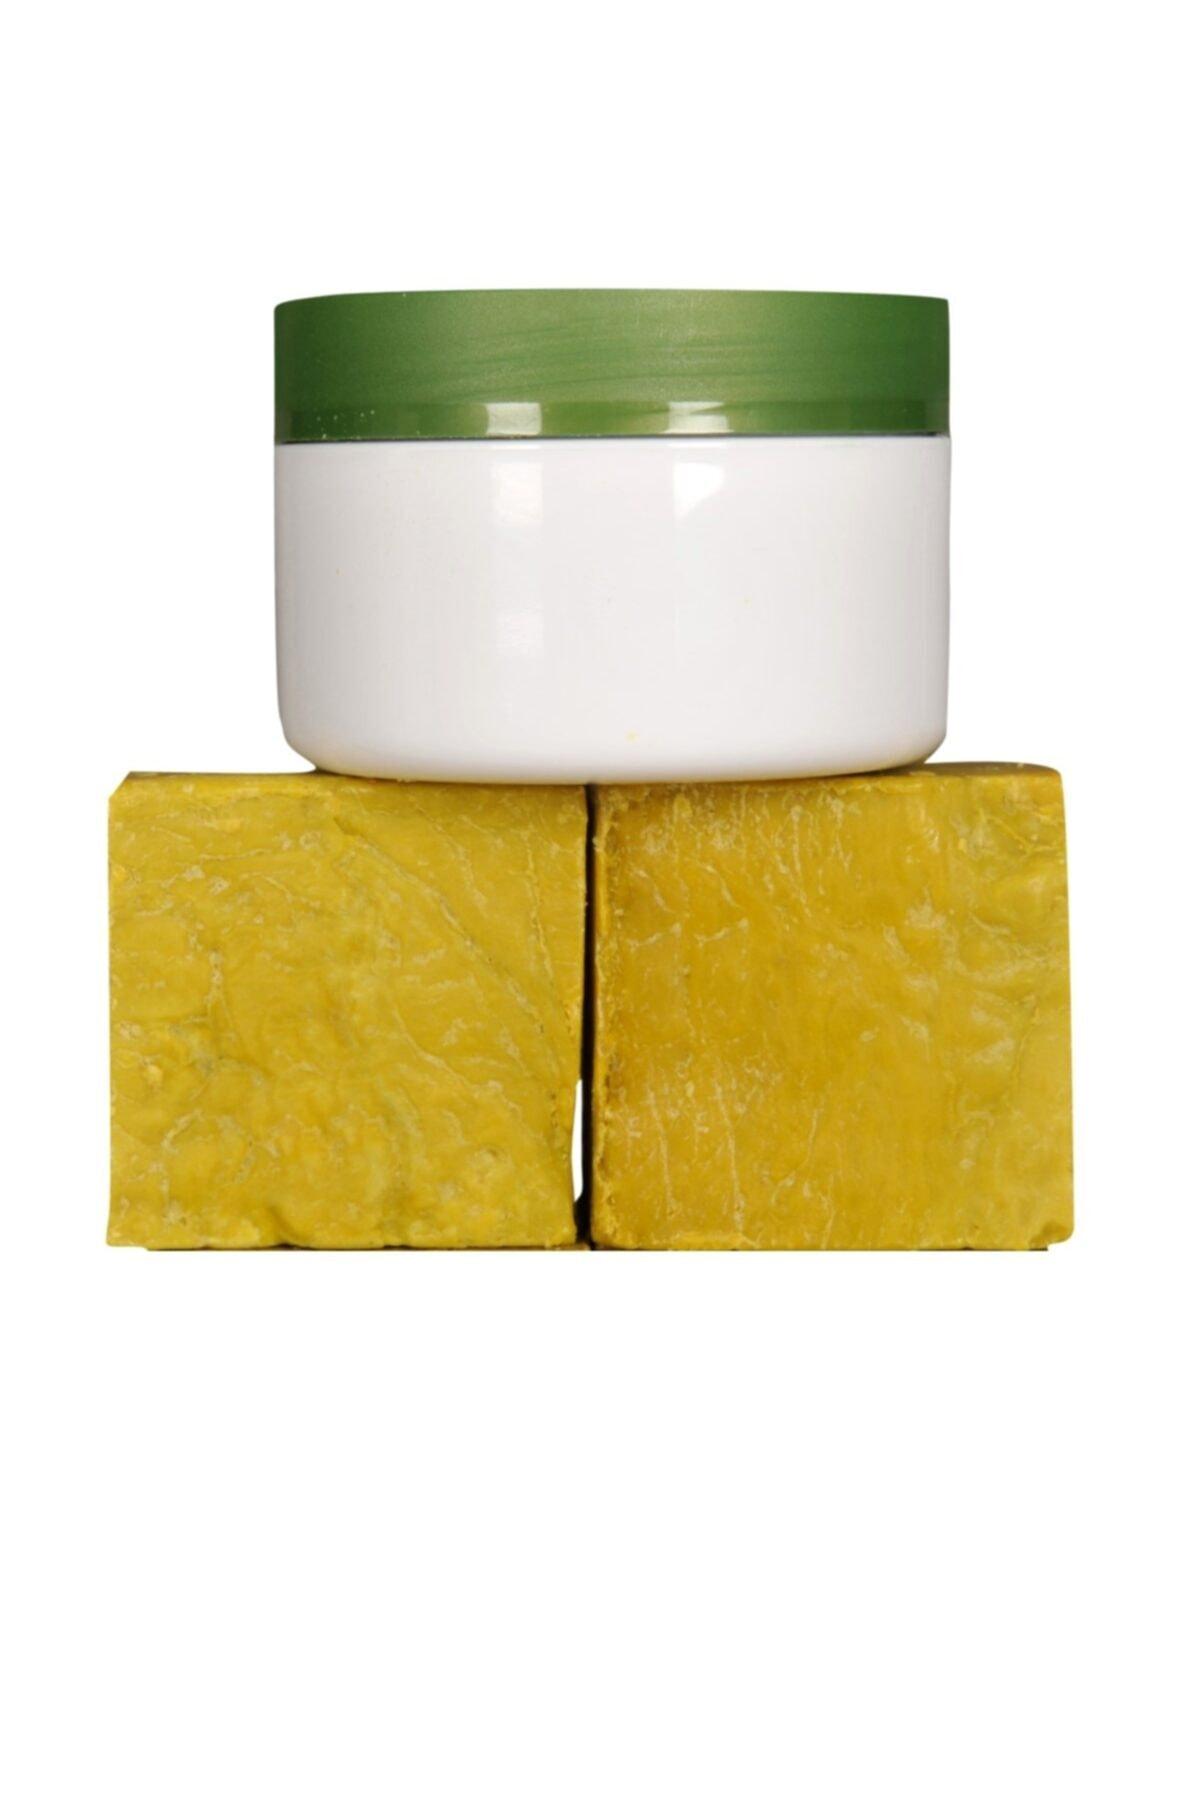 EVİN SİİRT ÜRÜNLERİ 250 Gr( 2 Kalıp) Yeşil Siirt Bıttım Sabunu + 1 Adet Bıttım Kremi 1